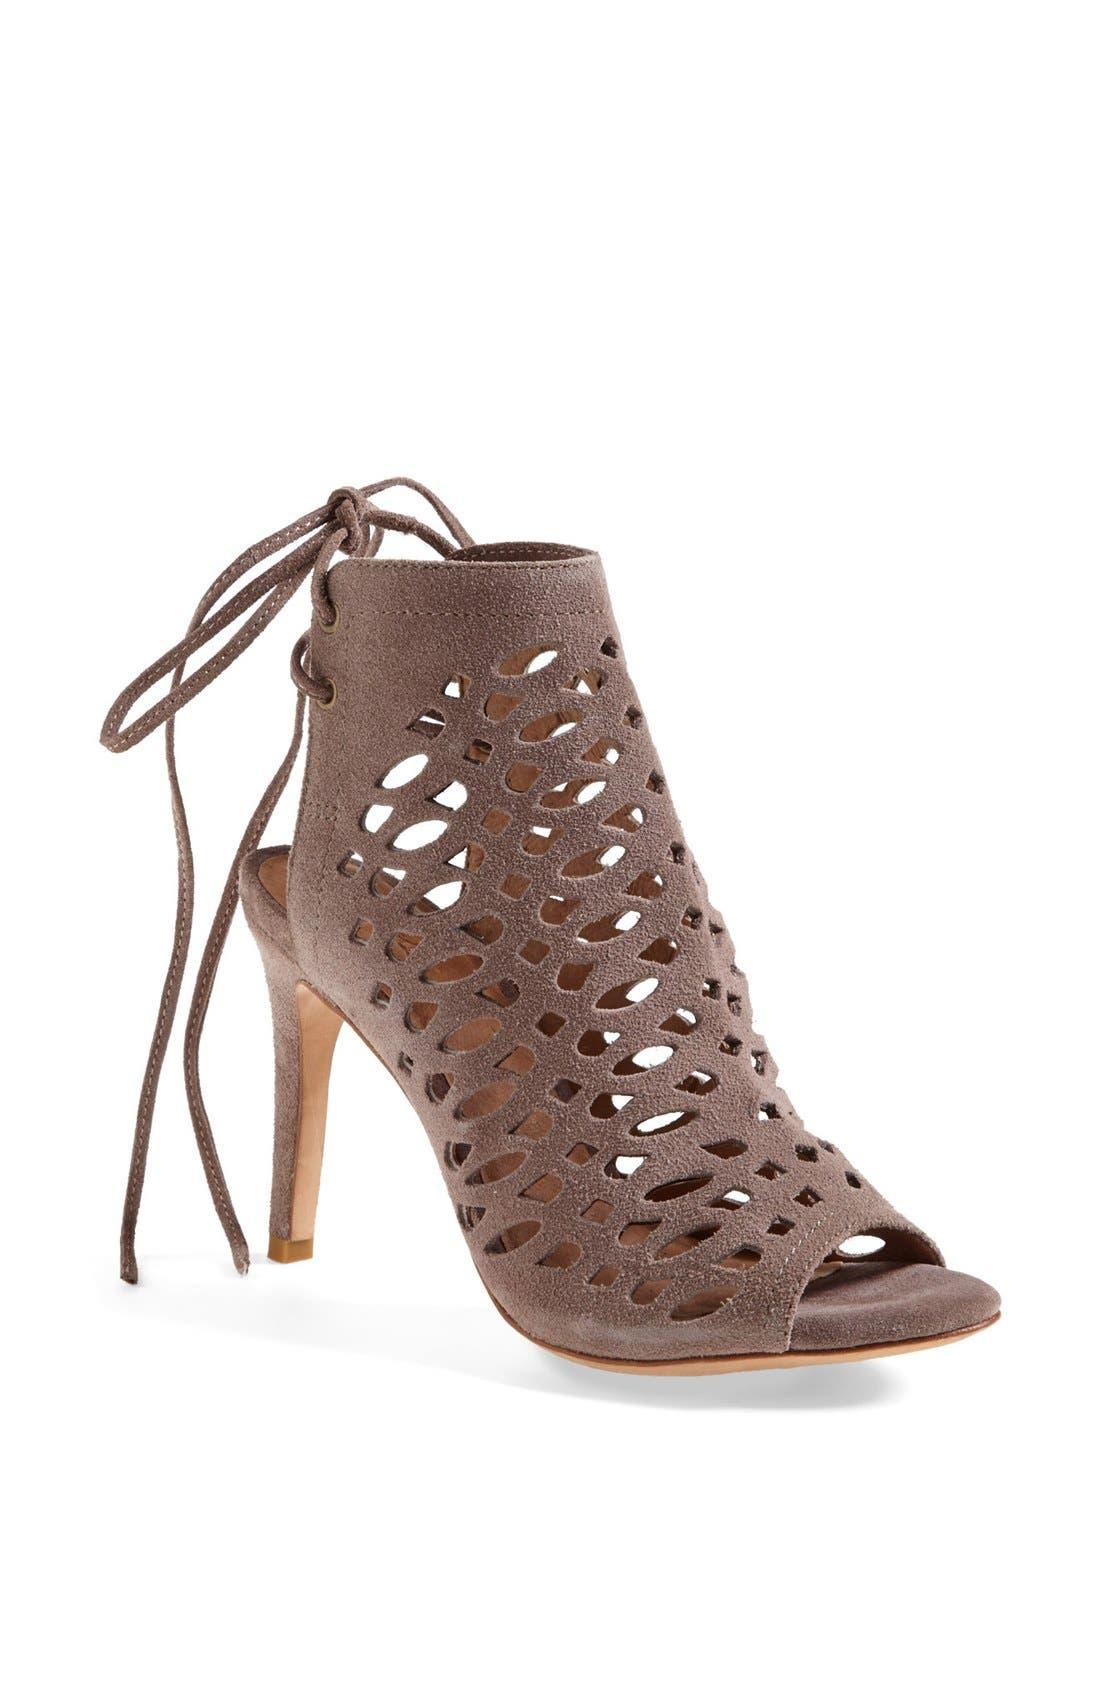 Main Image - Joie 'Clayton' Sandal